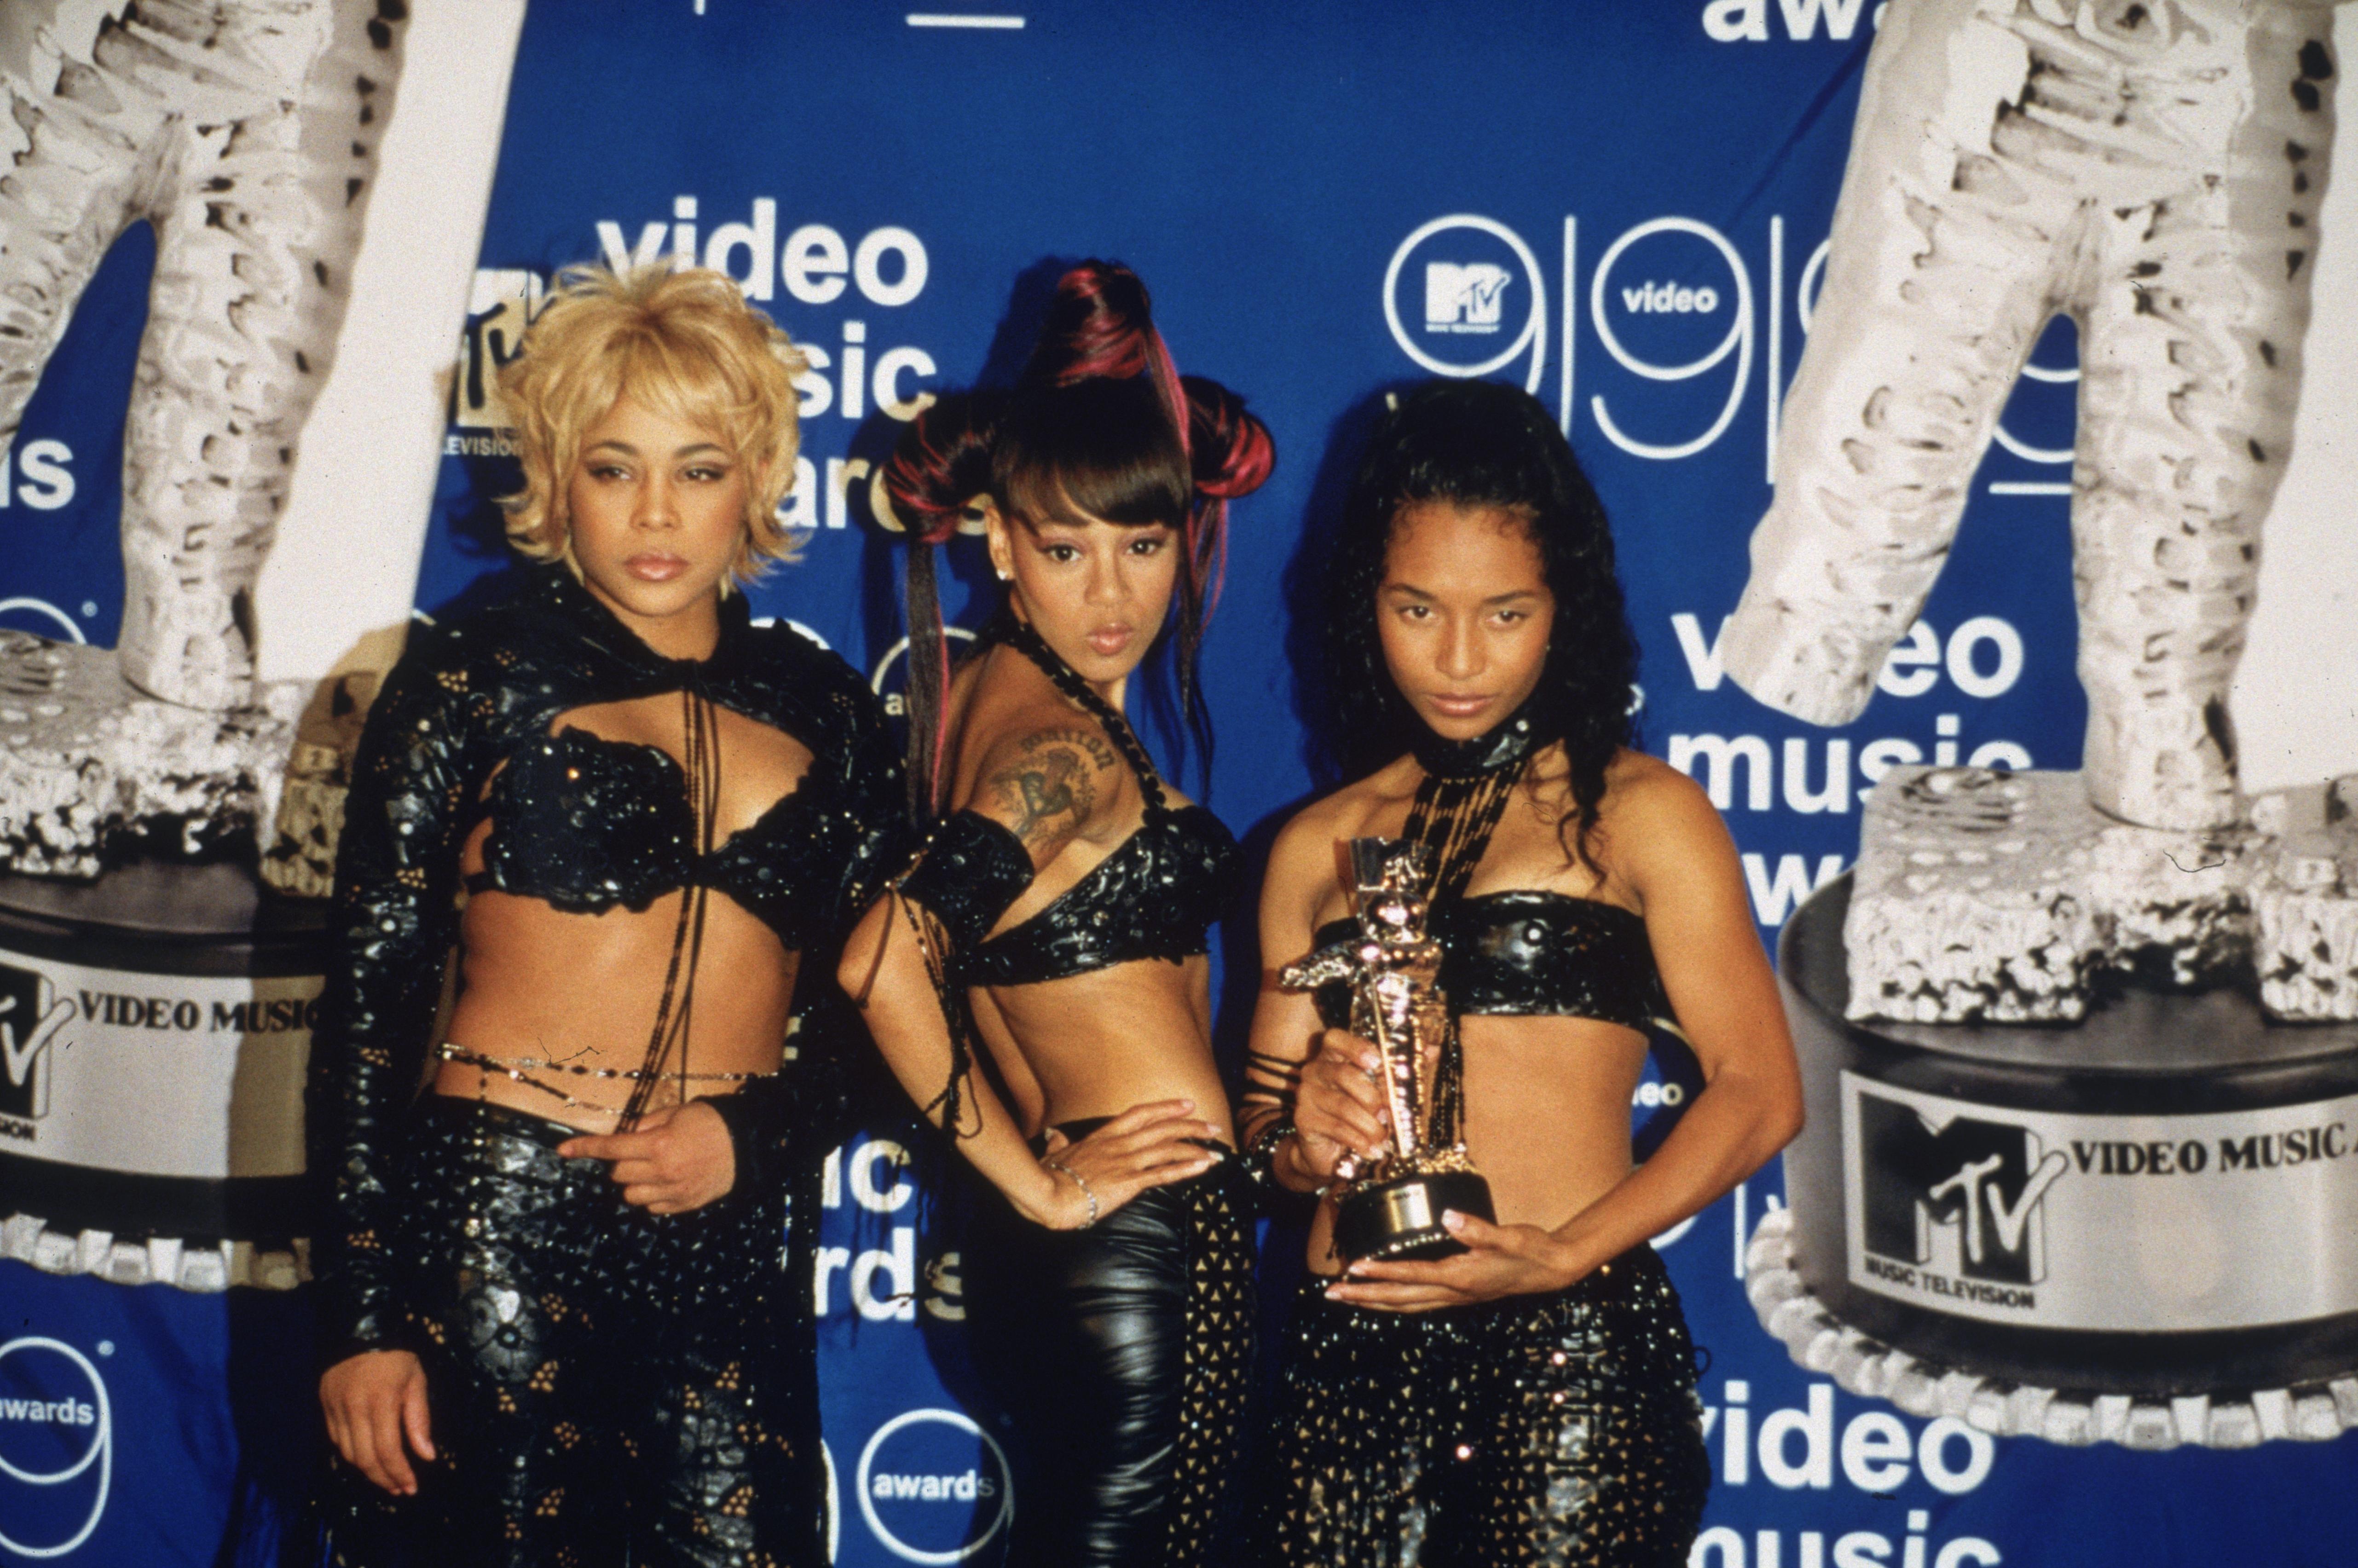 TLC Award